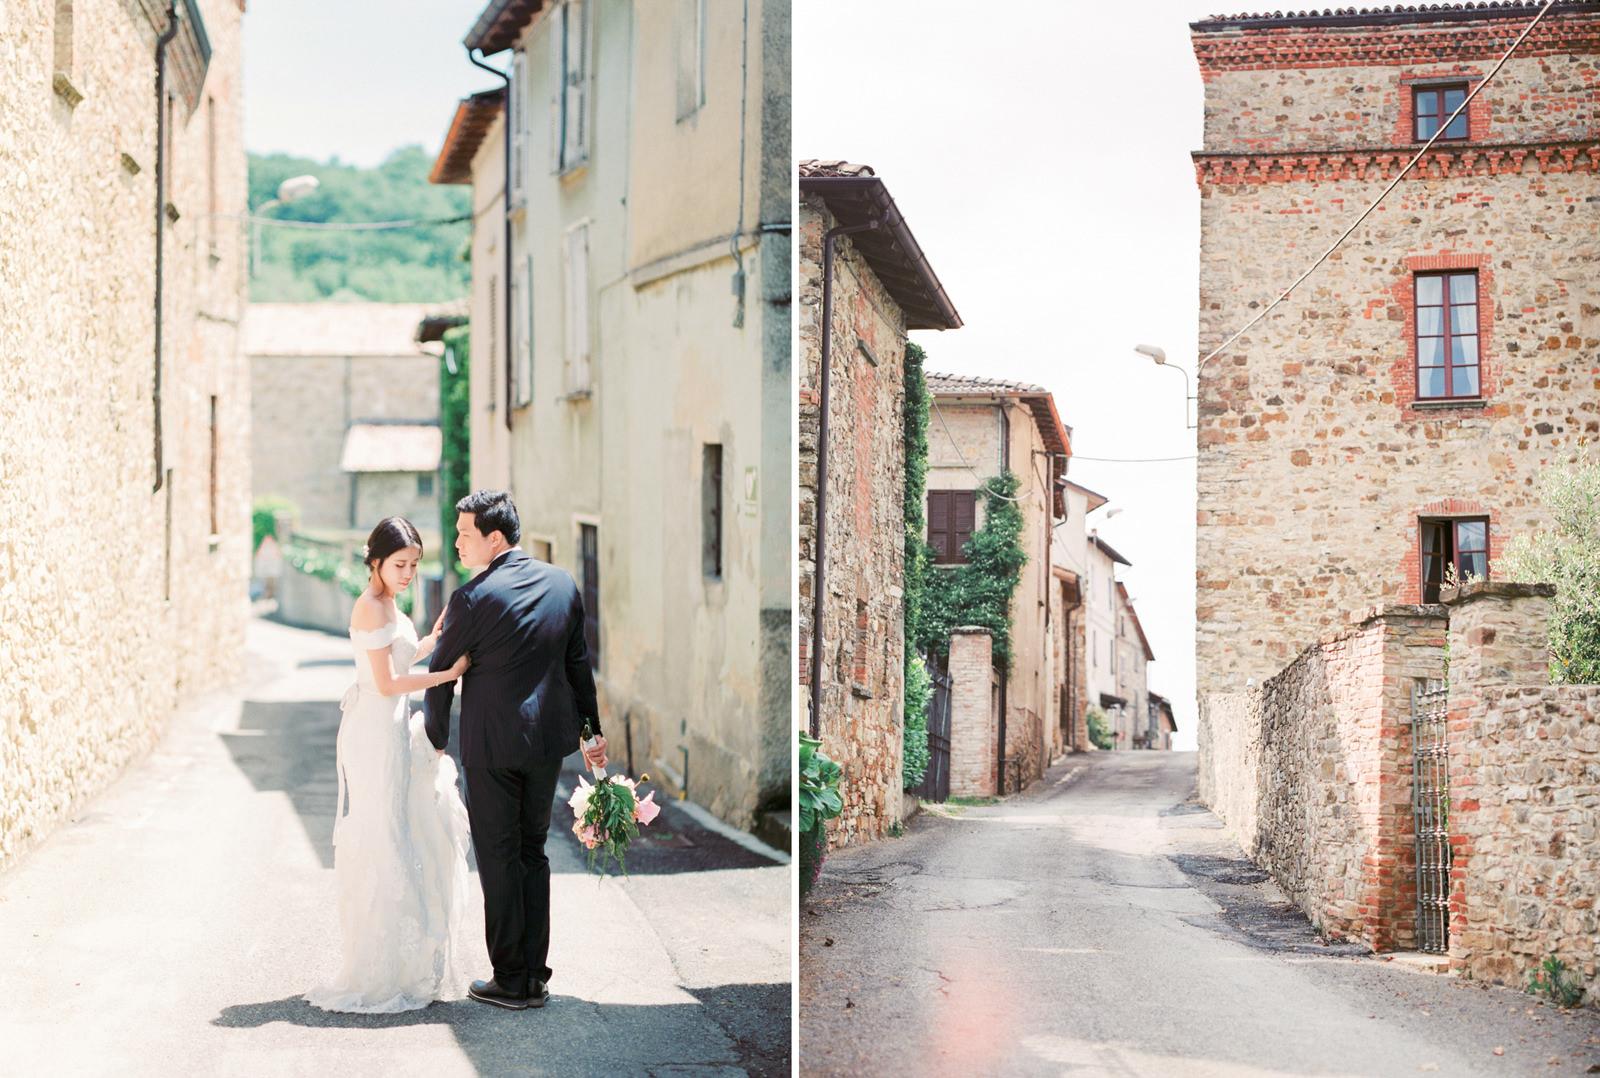 Milan Italy Wedding Photographer - CHYMO & MORE www.chymomore.com